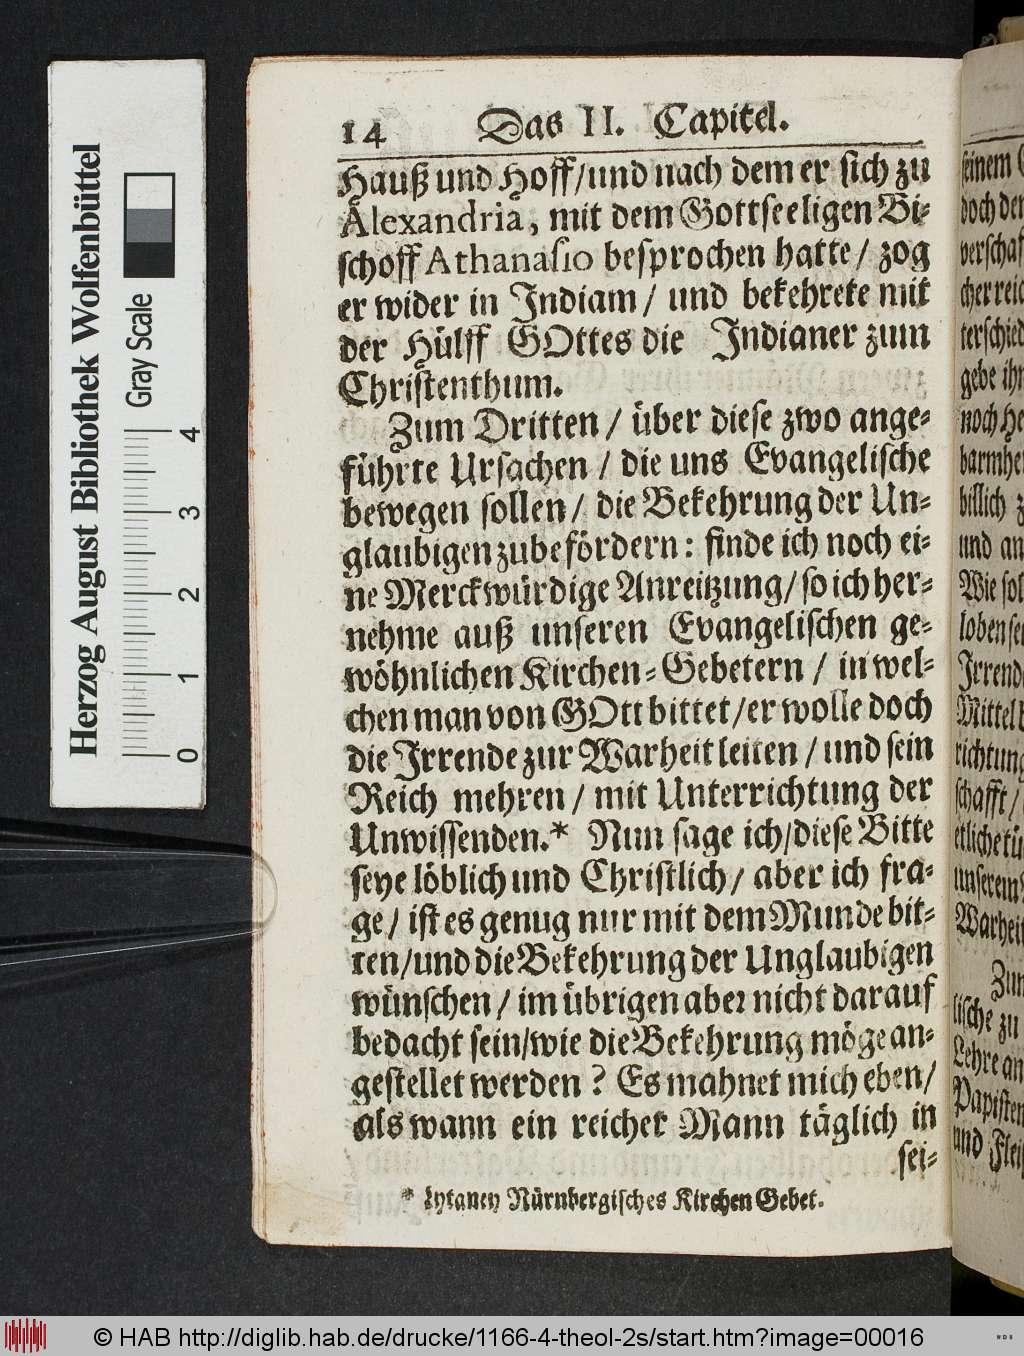 http://diglib.hab.de/drucke/1166-4-theol-2s/00016.jpg